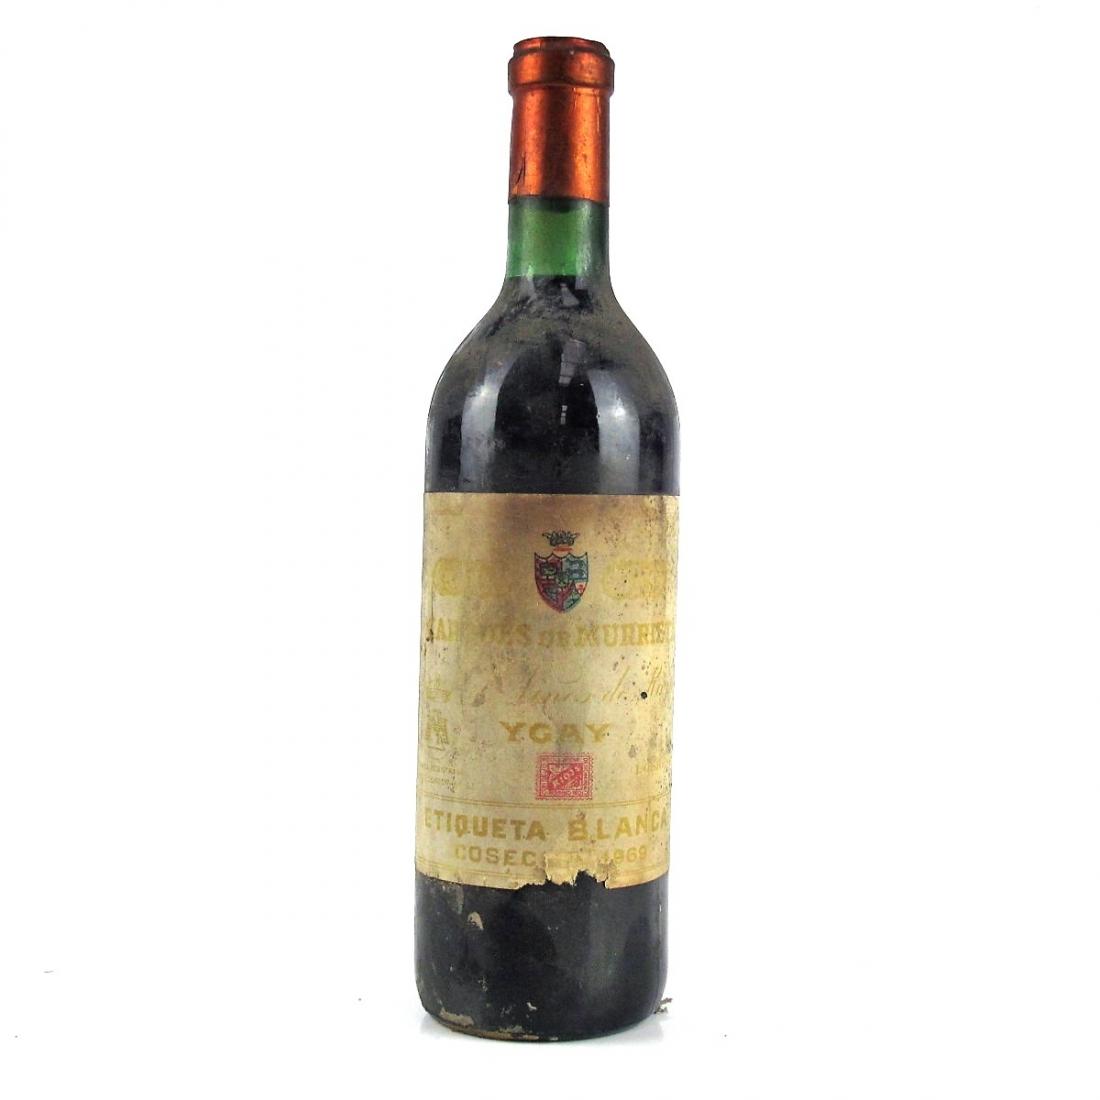 "Marques De Murrieta ""Etiqueta Blanca"" 1969 Rioja Crianza"